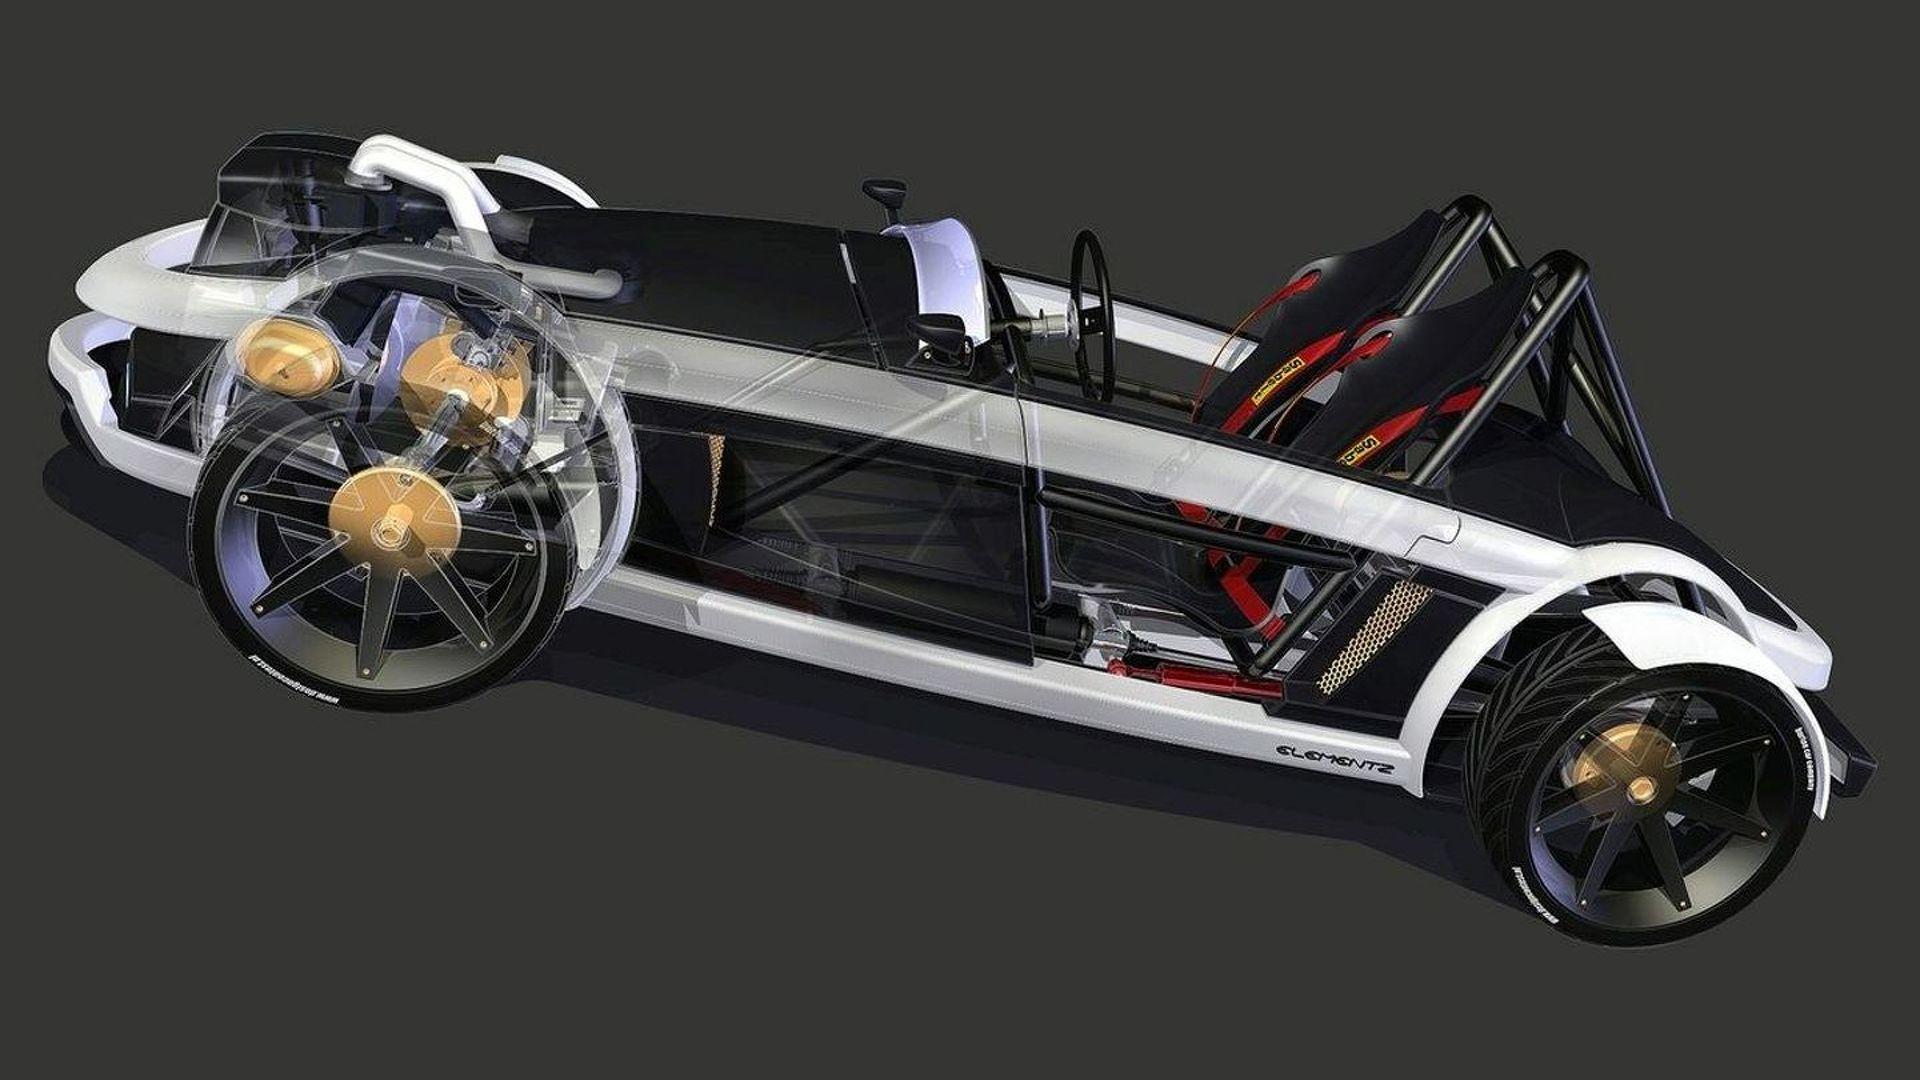 burton elementz kitcar concept. Black Bedroom Furniture Sets. Home Design Ideas